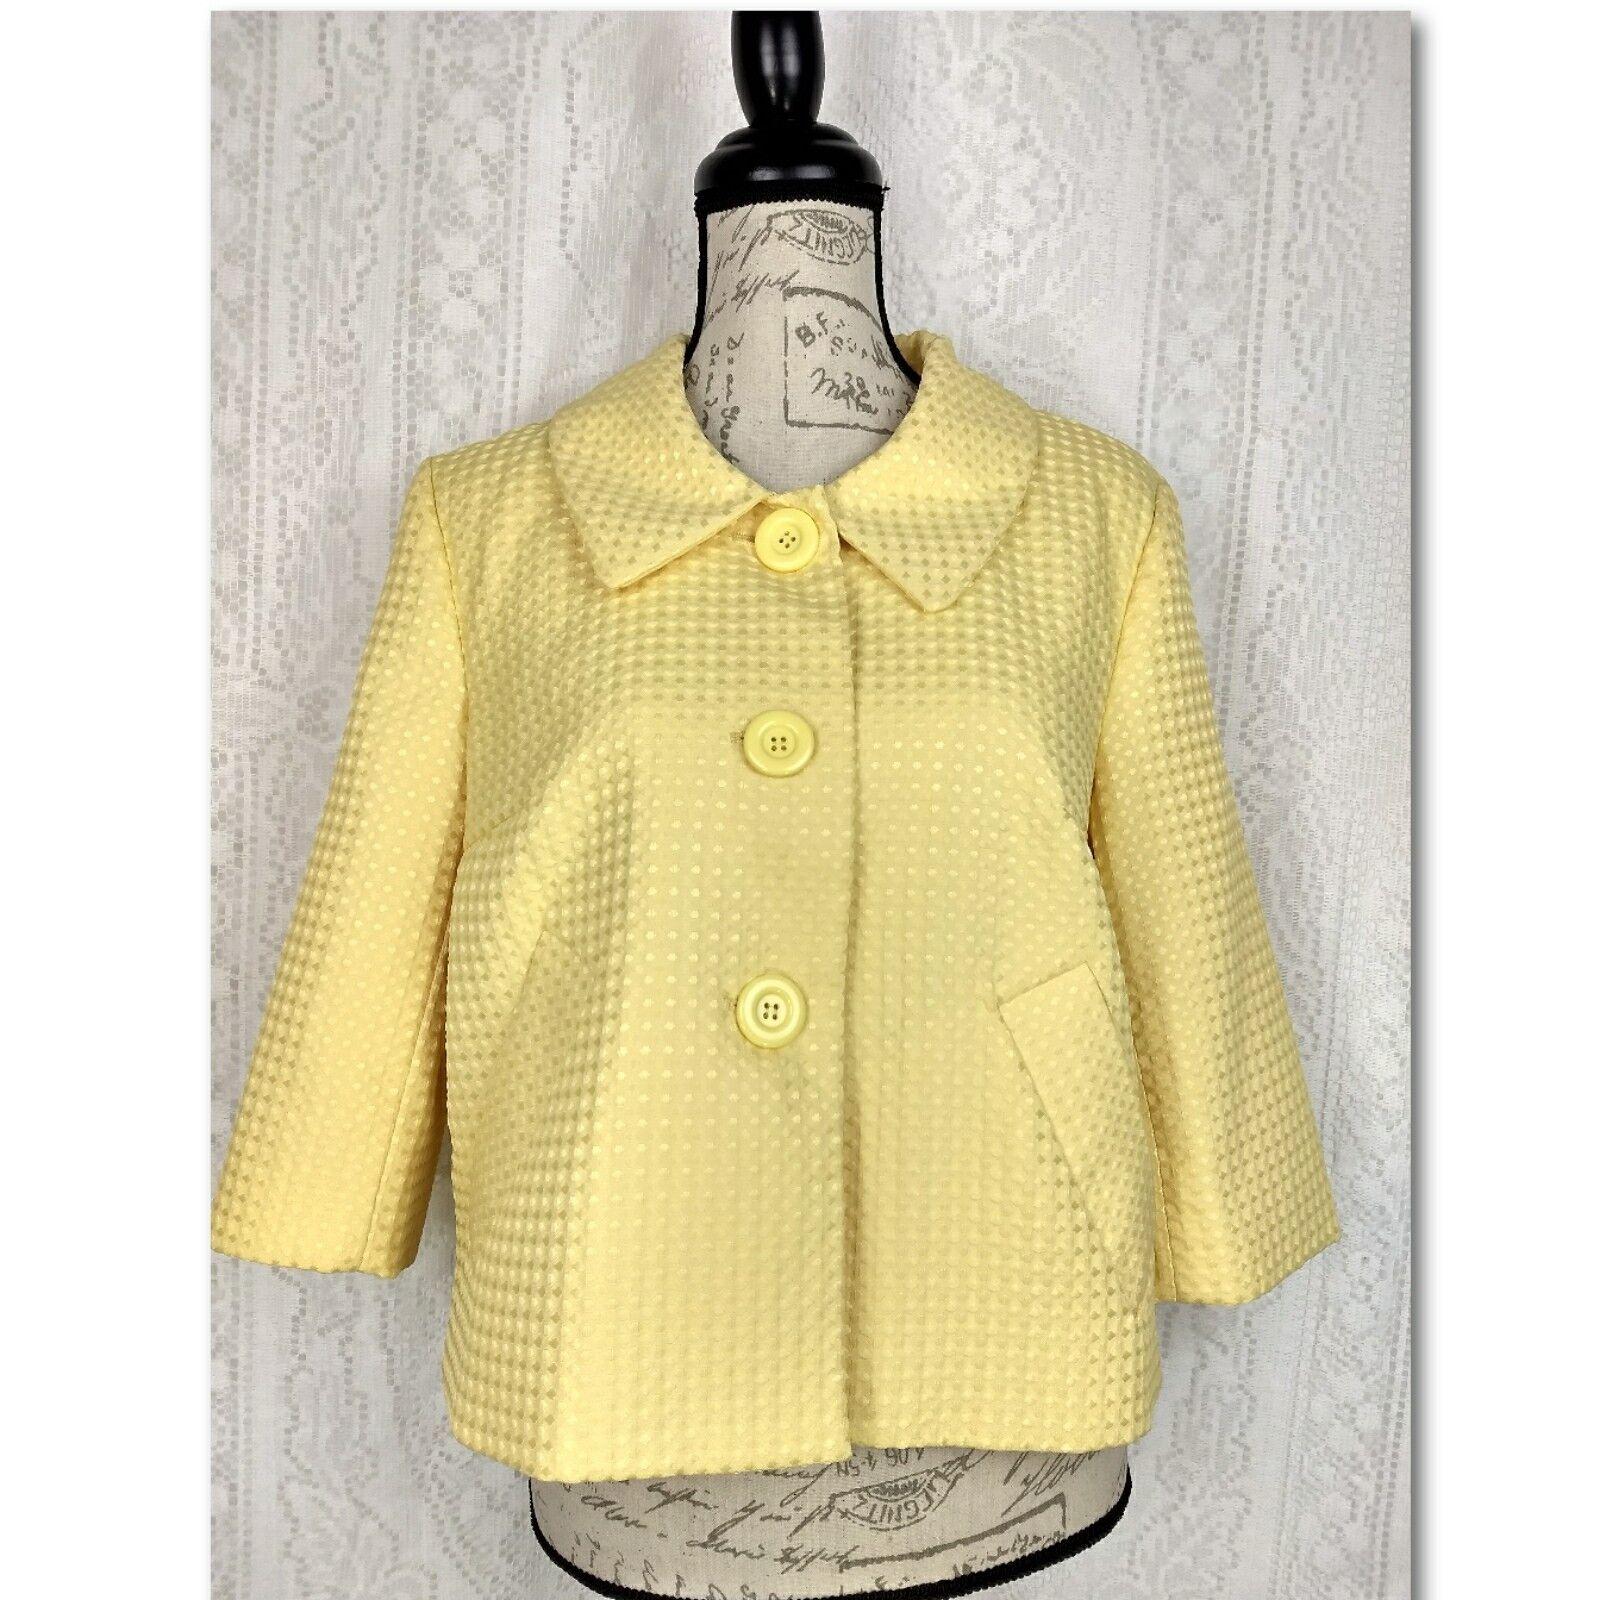 Spense Womens Blazer Size Medium Yellow 3 4 Sleeve Button Textured